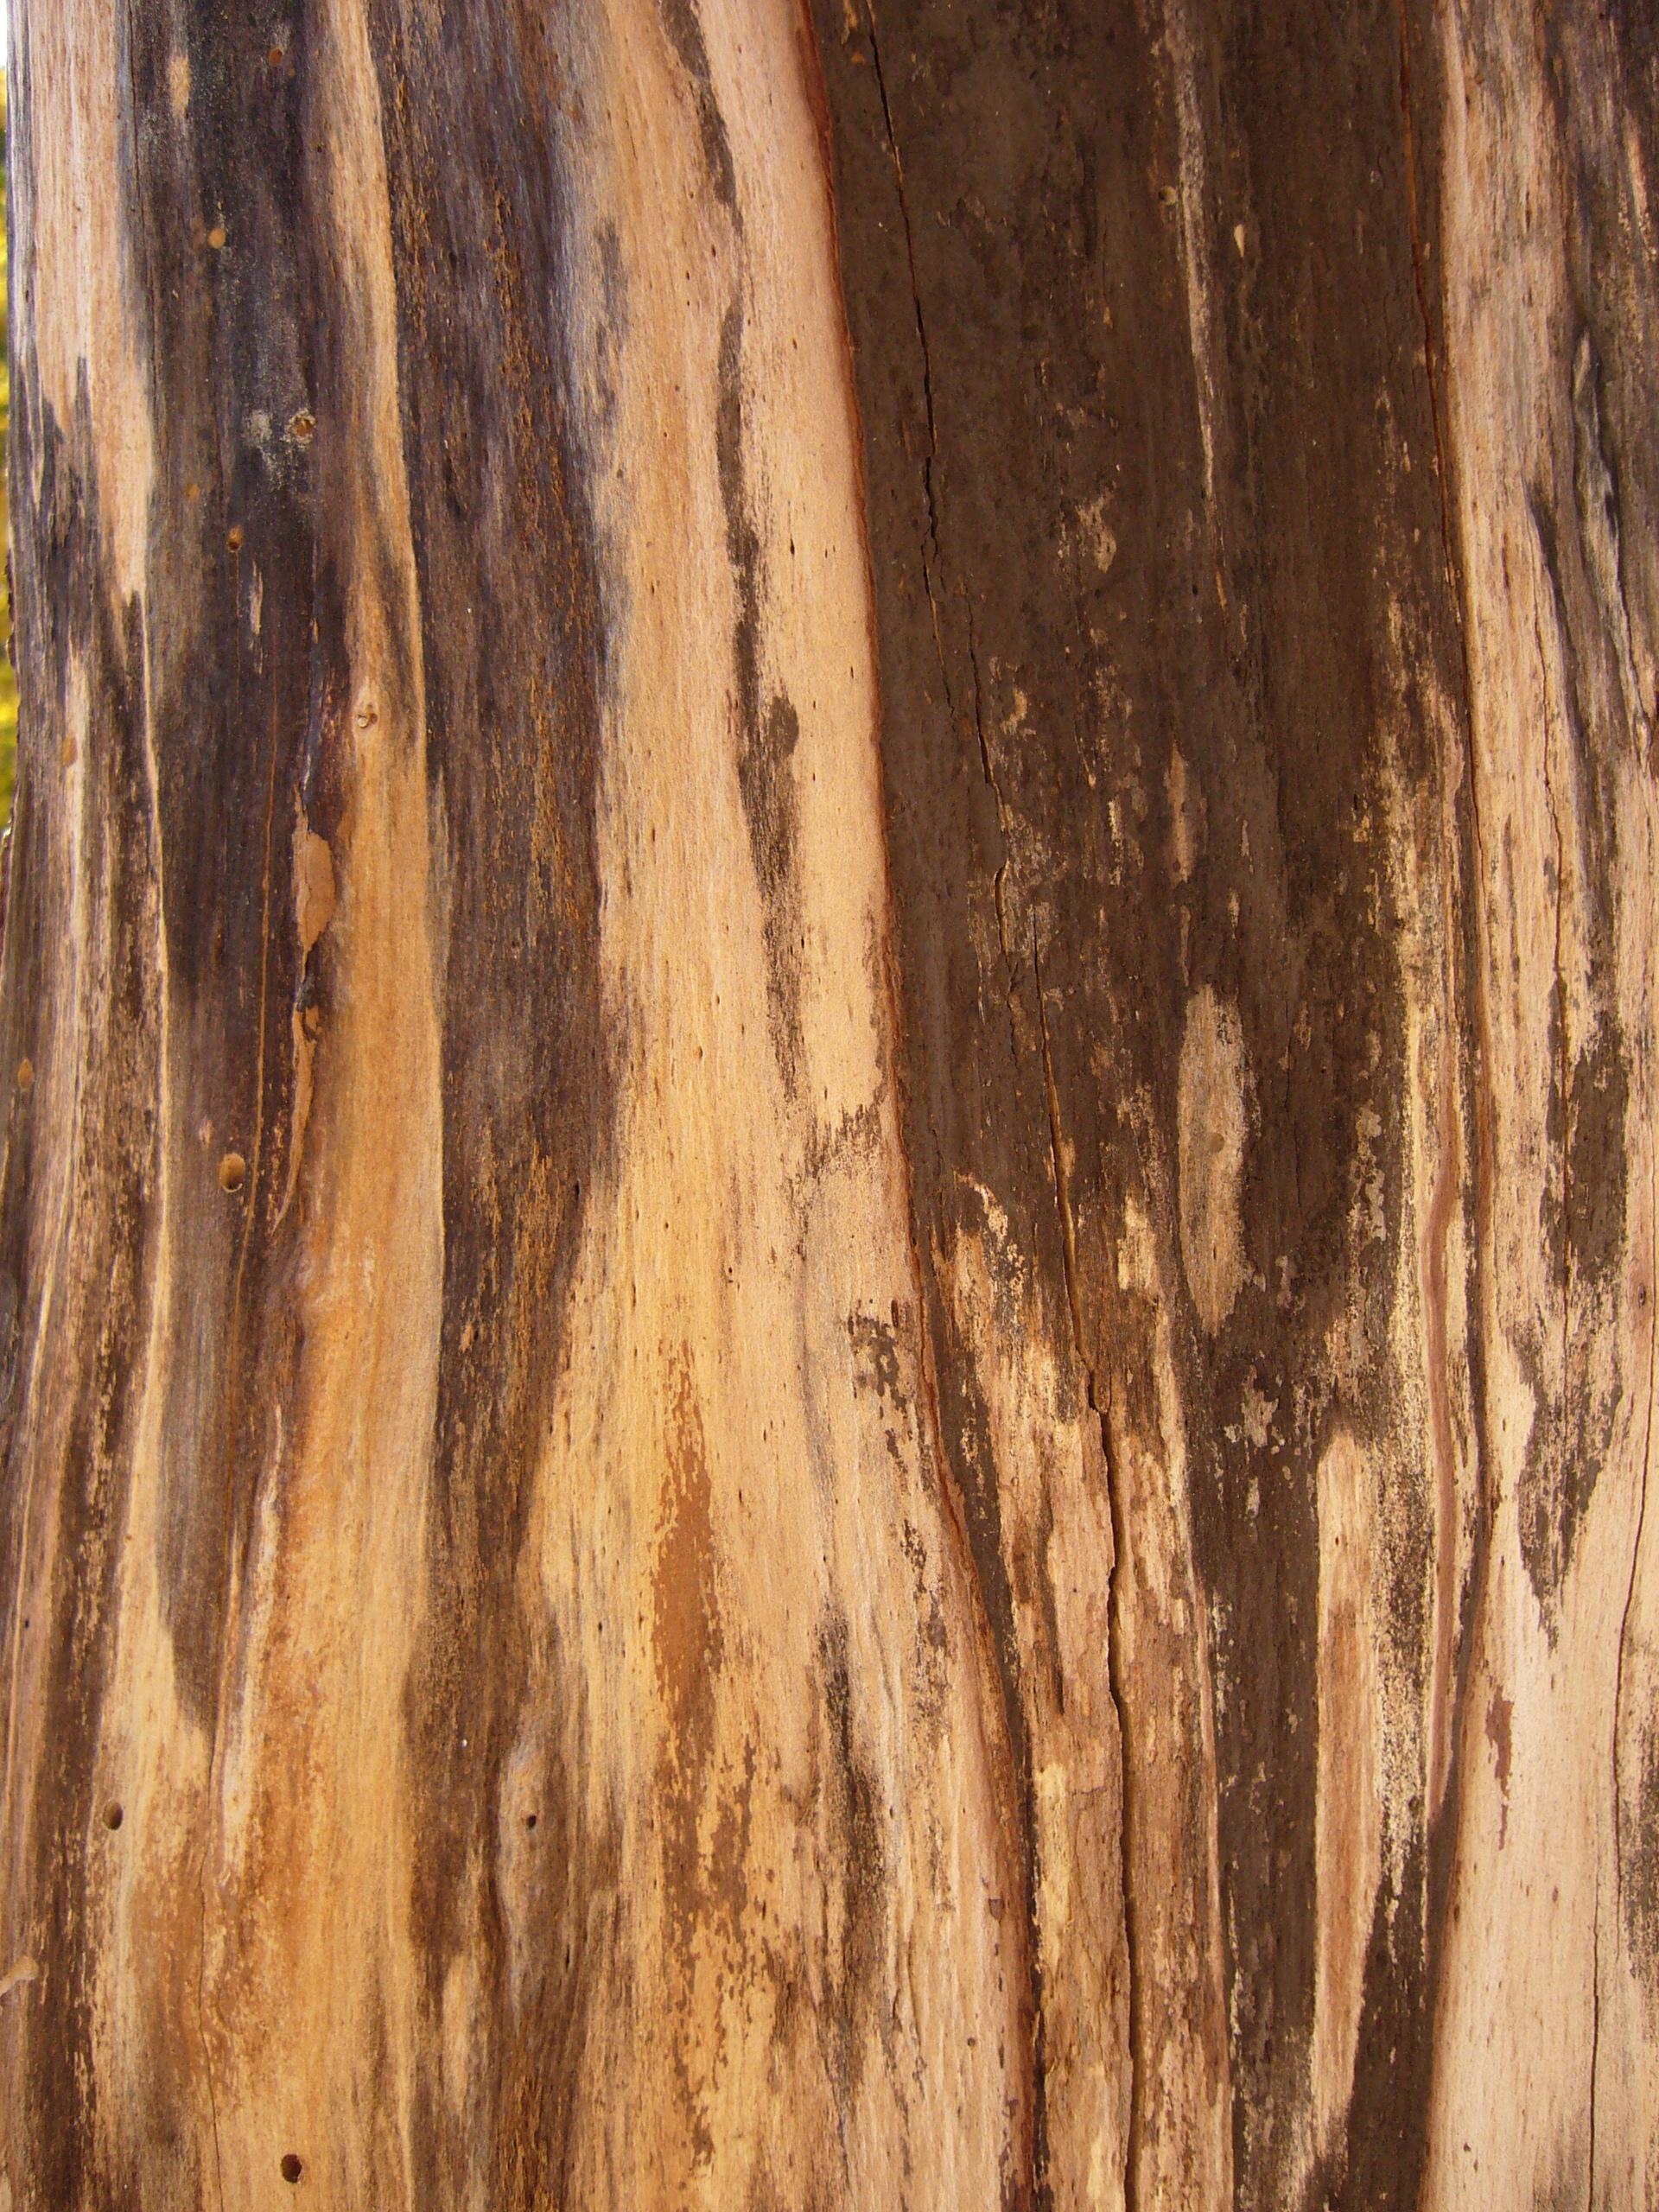 Free Wood texture (grain, pattern, trunk)